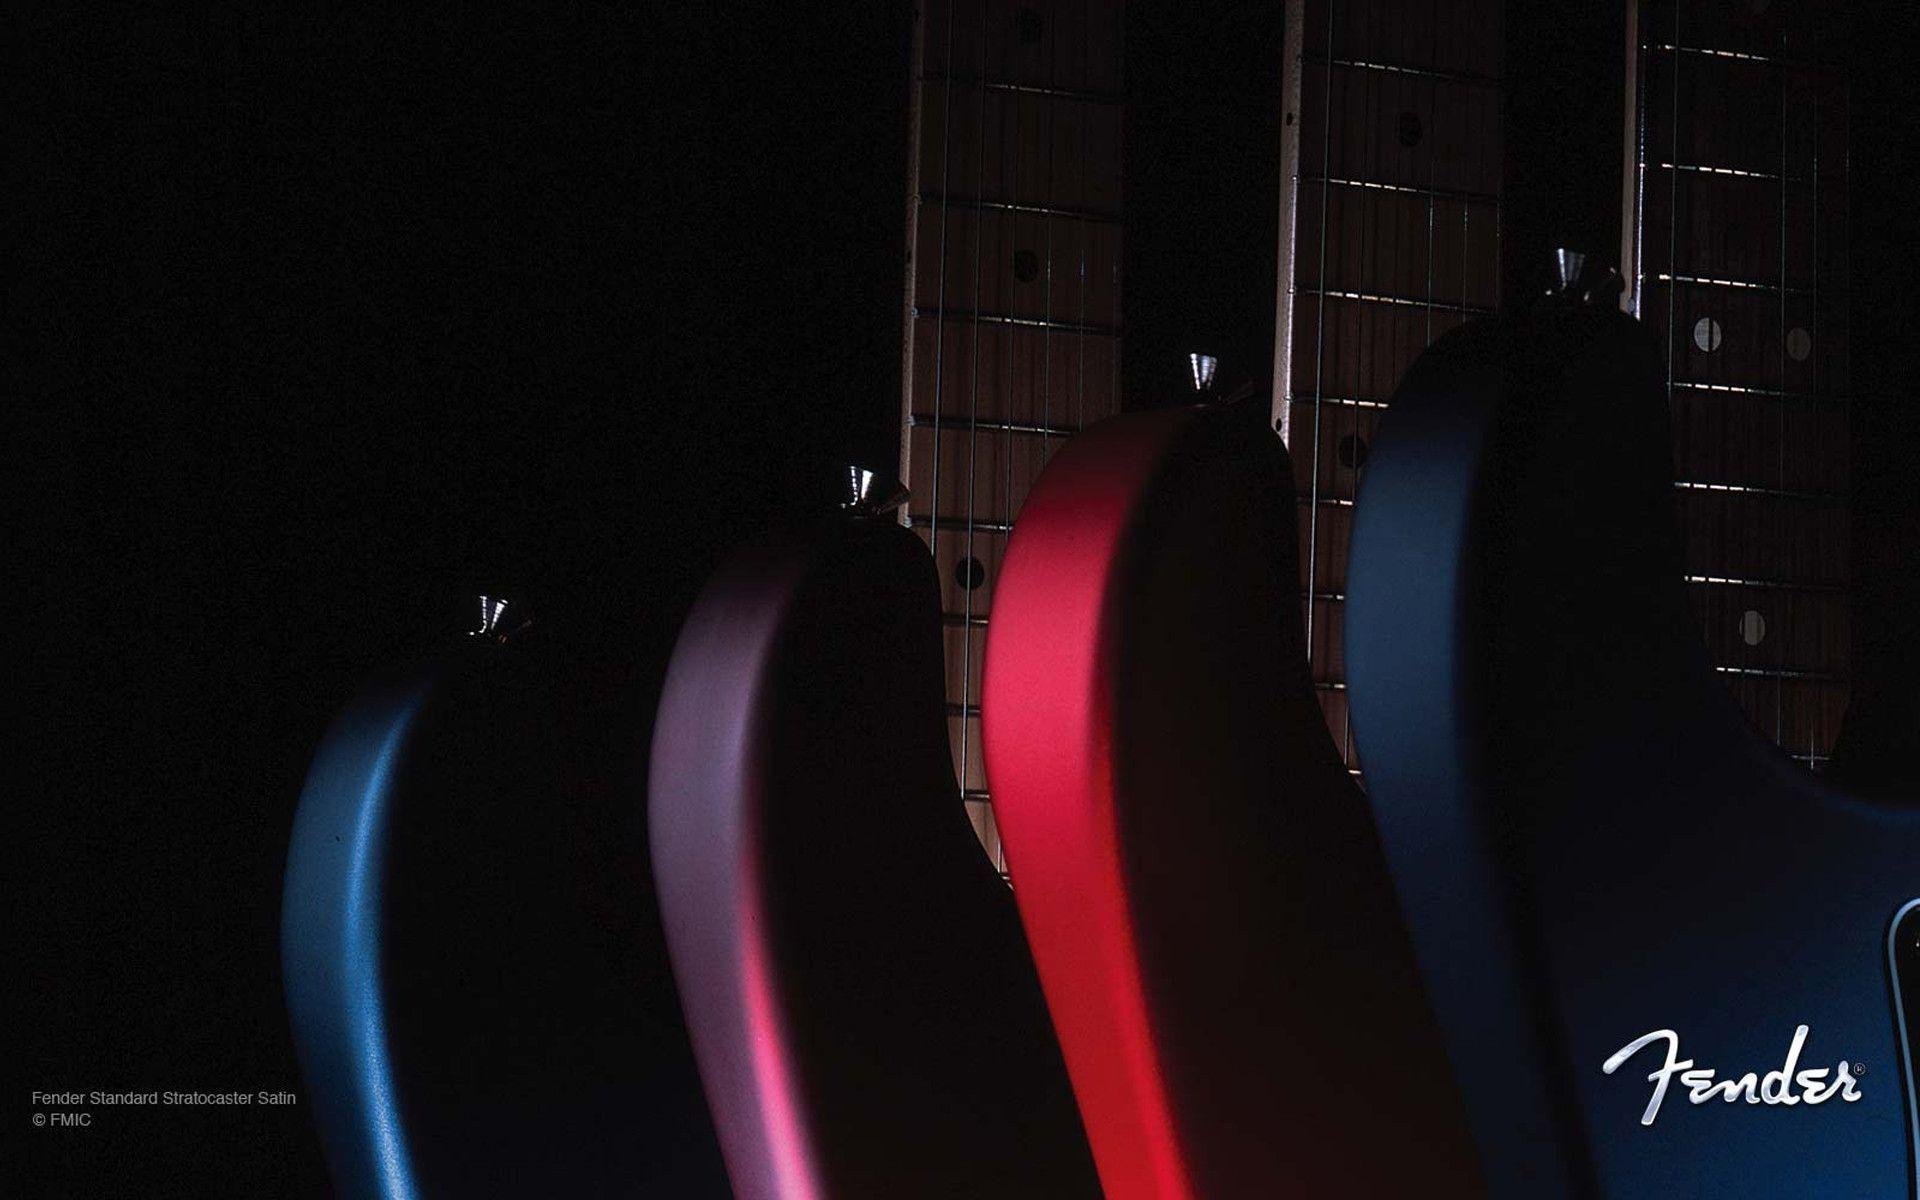 Fender Guitar Wallpapers - Full HD wallpaper search